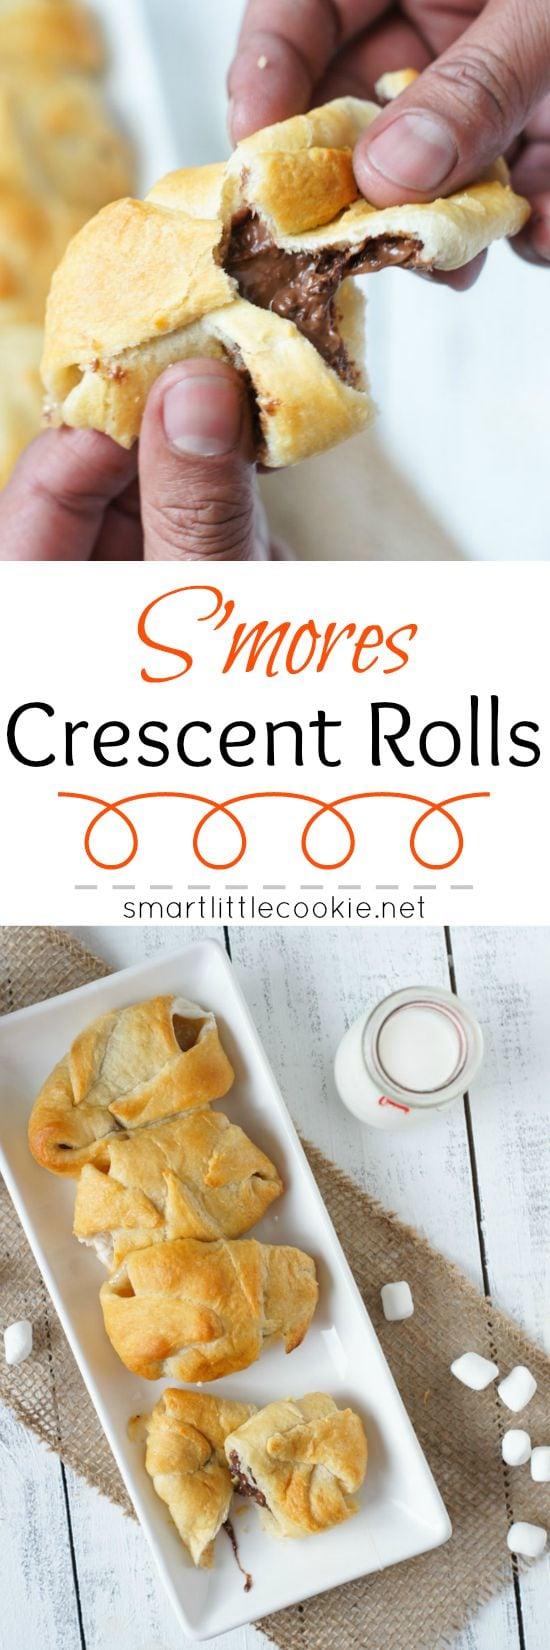 S'mores Crescent Rolls | smartlittlecookie.net